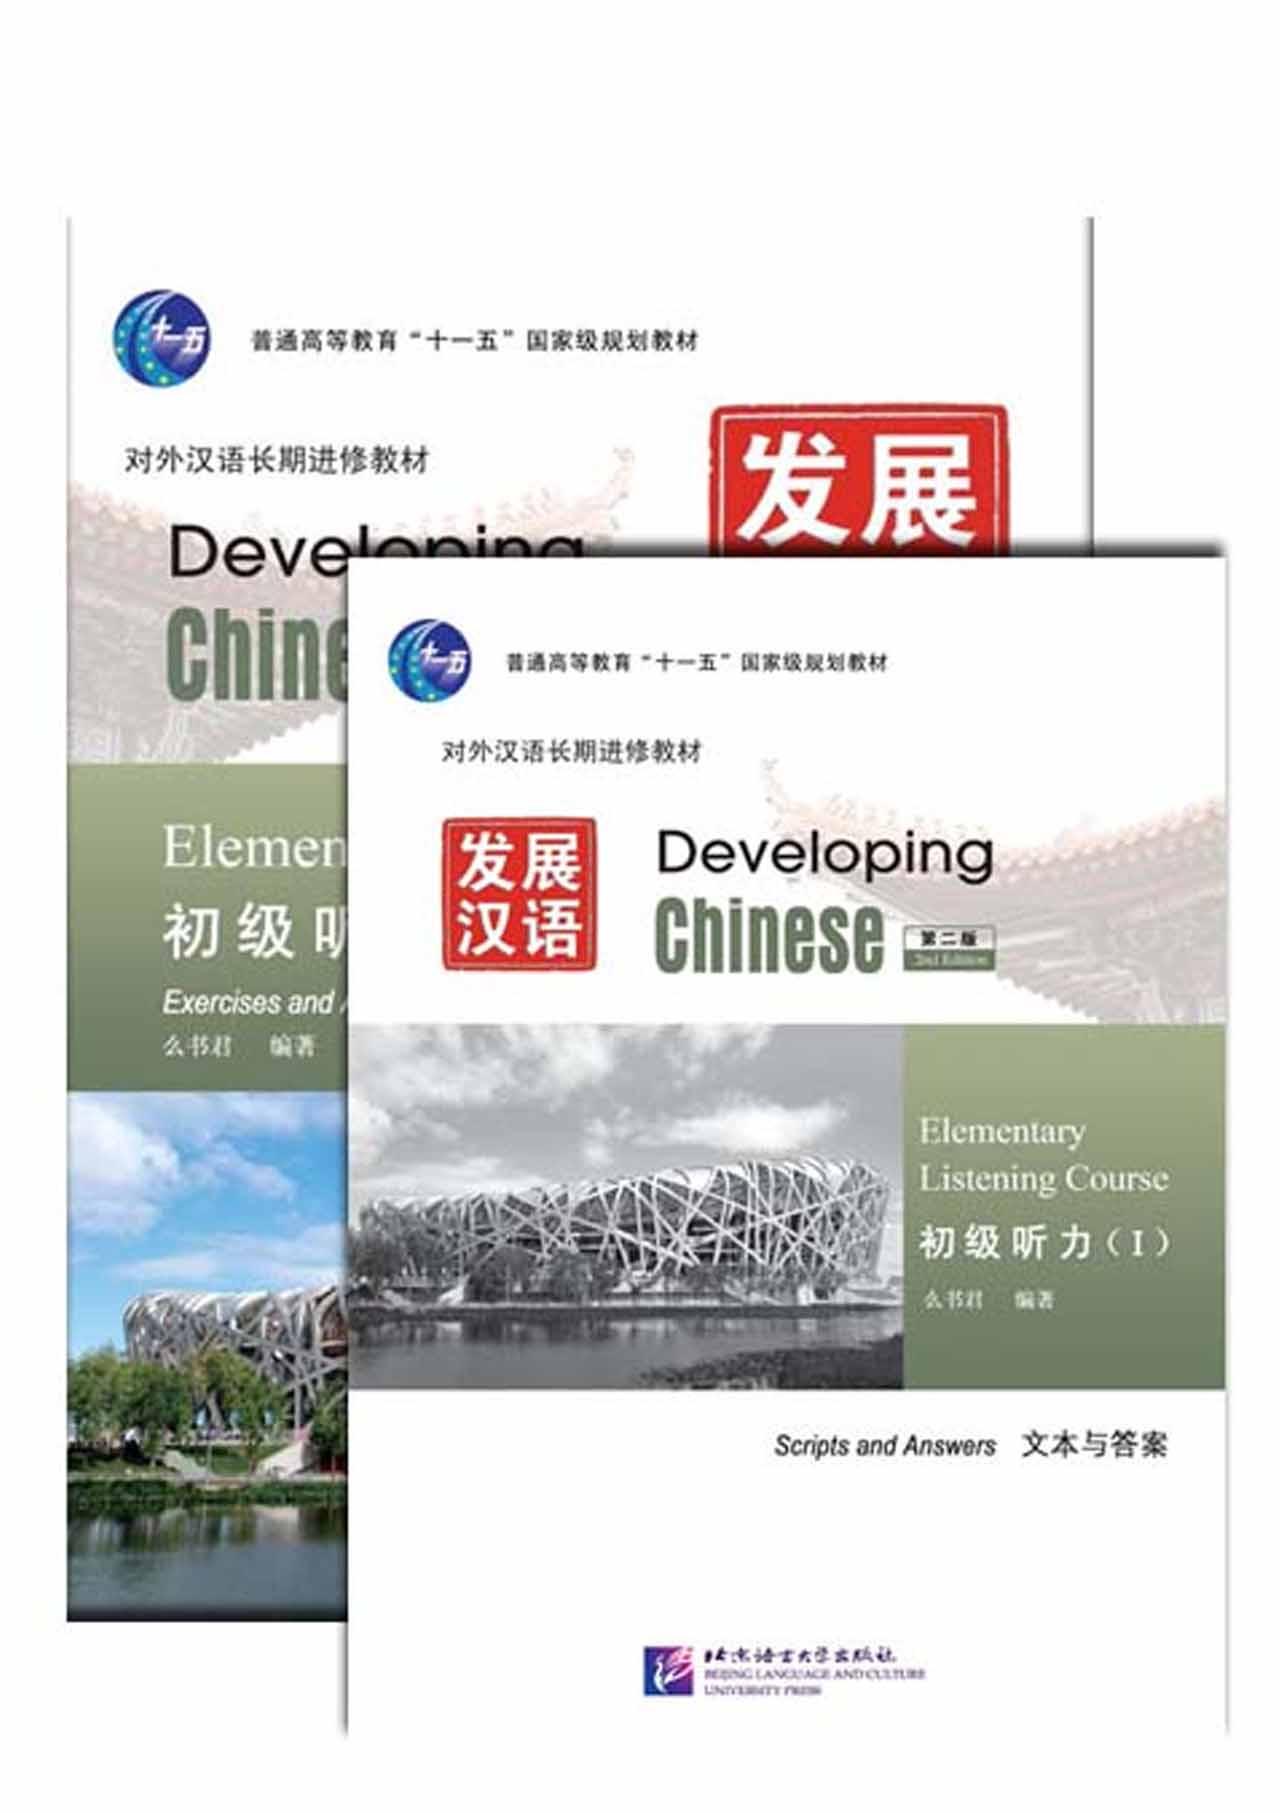 Developing Chinese (2nd Edition) Elementary Listening Course Ⅰ+MP3 发展汉语(第2版)初级听力(Ⅰ)(练习与活动+文本与答案,含1MP3)